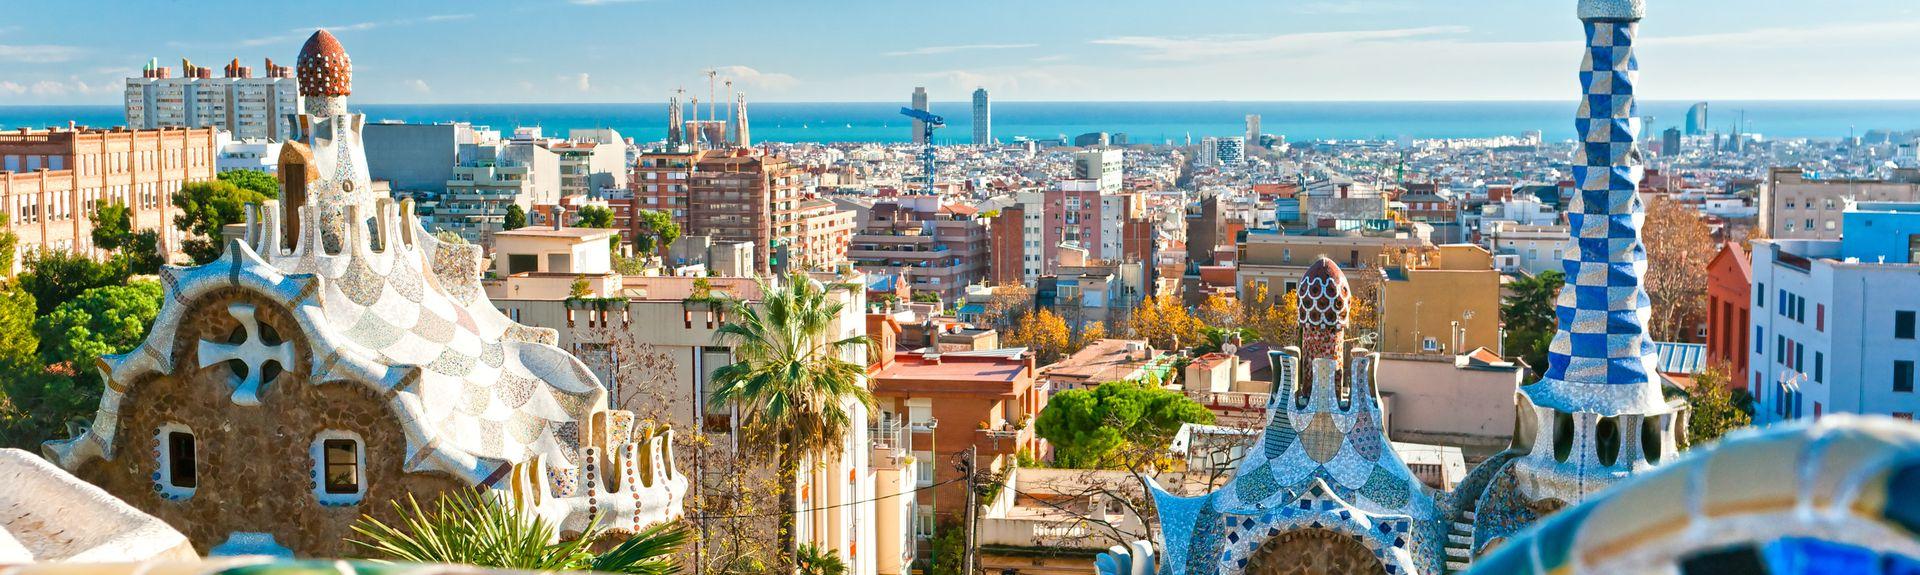 Barcelona, Barcelona, Cataluña, España